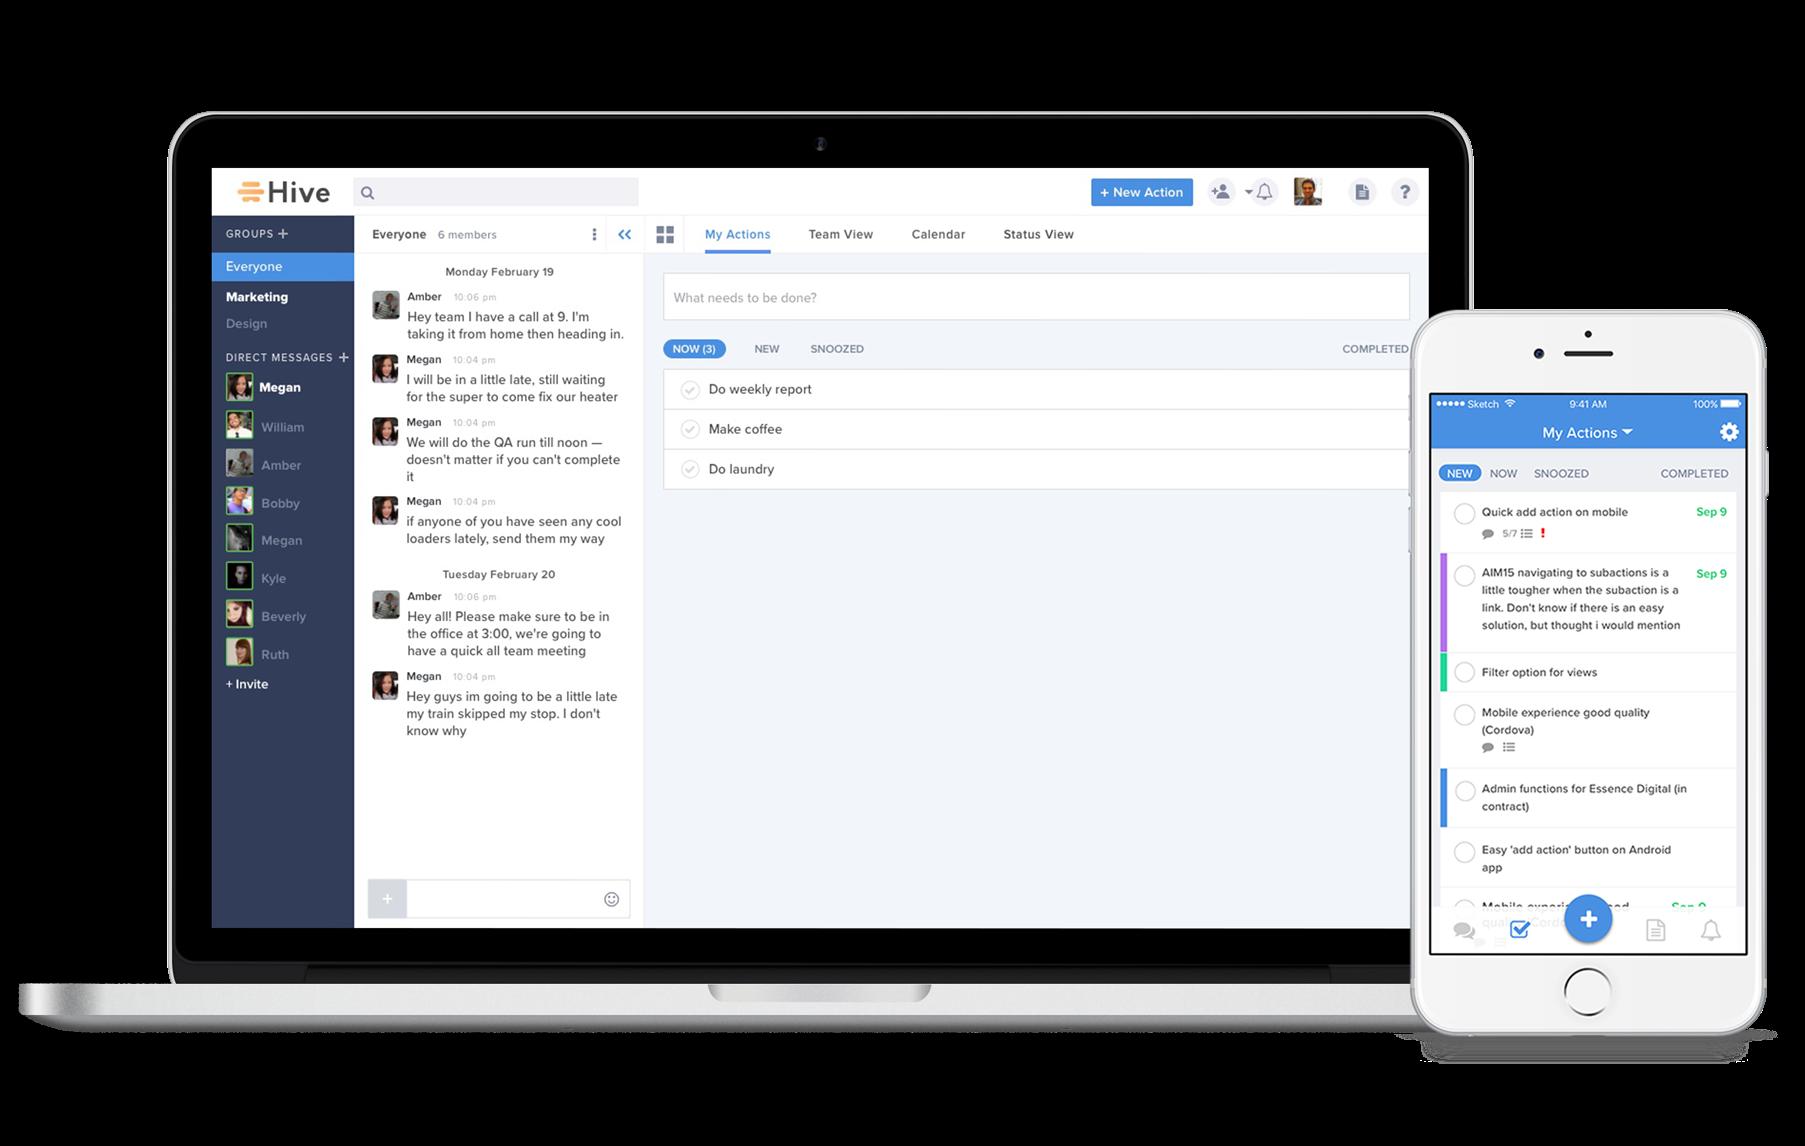 Hive_MacBook-and-iPhone-Mockup.png